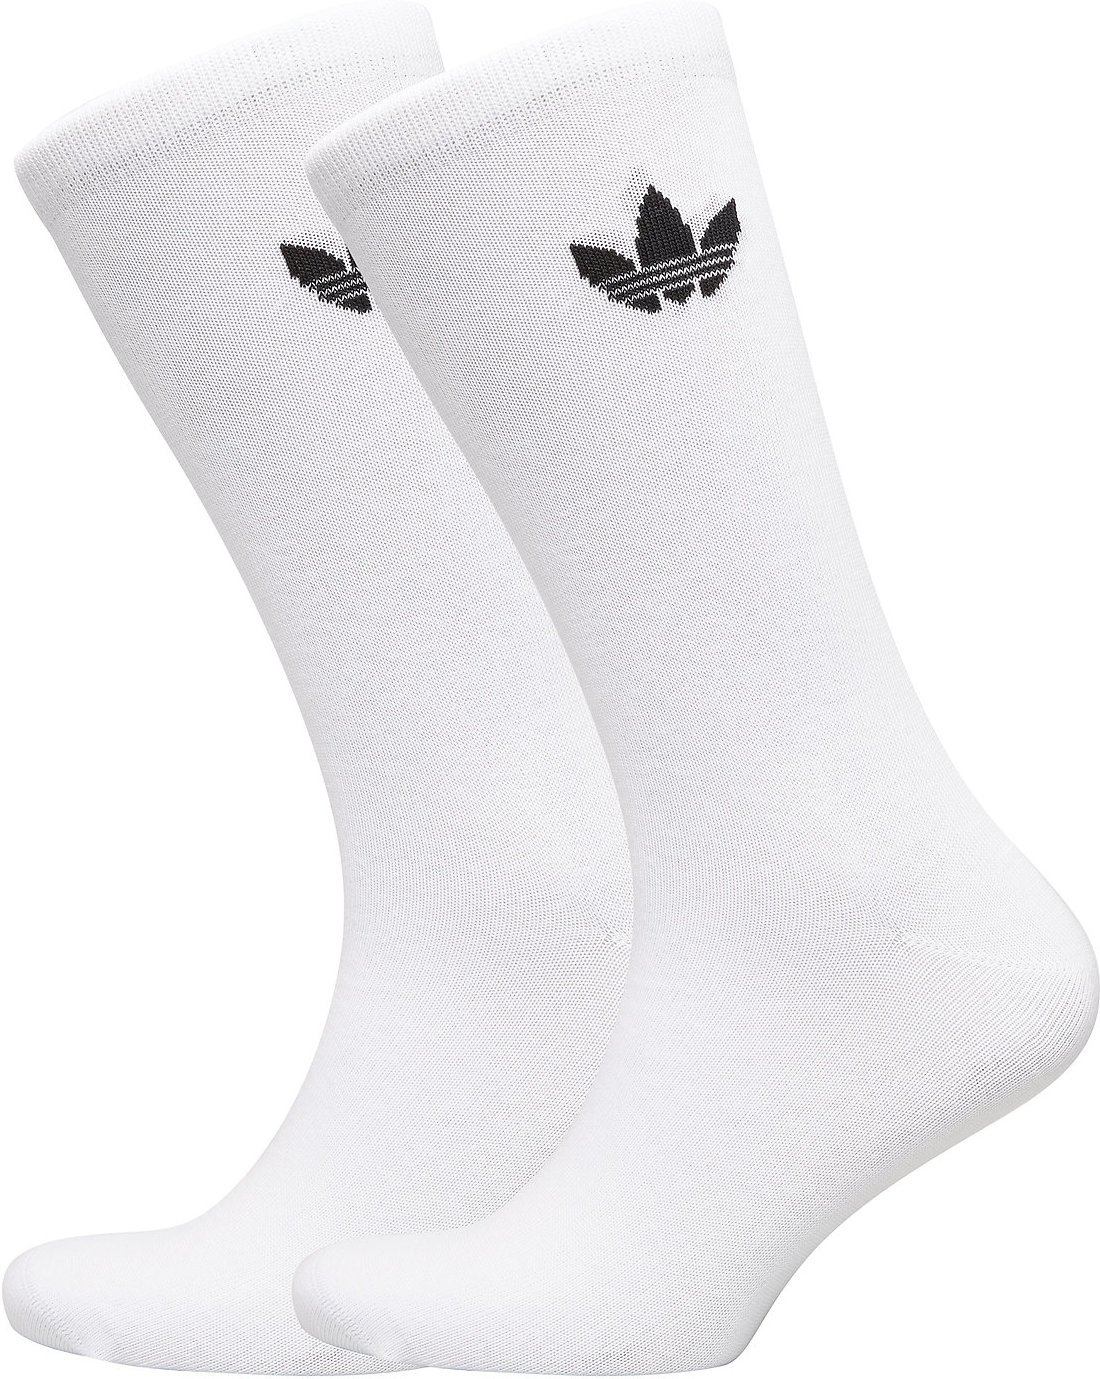 Adidas Originals Thin Trefoil Crew Socks (2 pack)